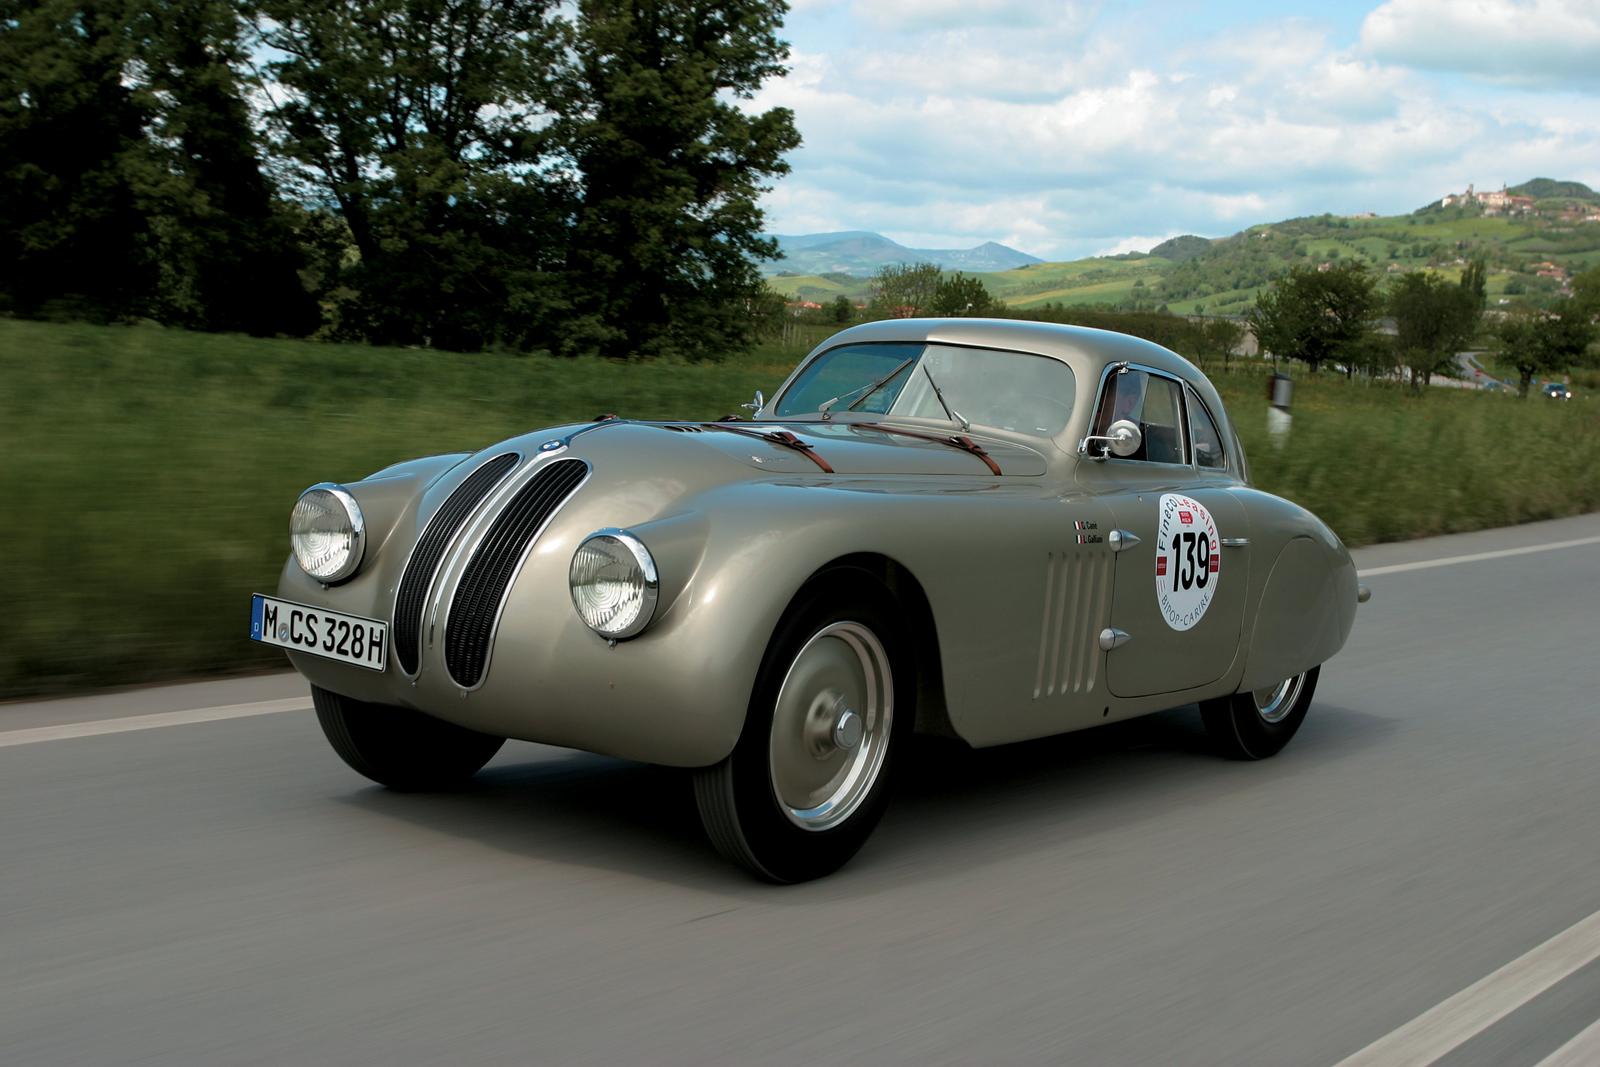 http://1.bp.blogspot.com/-zlCoGKfLMow/TdCA8BVmcJI/AAAAAAAAARU/d9W7txQDOmM/s1600/BMW-328-Mille-Miglia-Coupe-cars-wallpapers.jpg